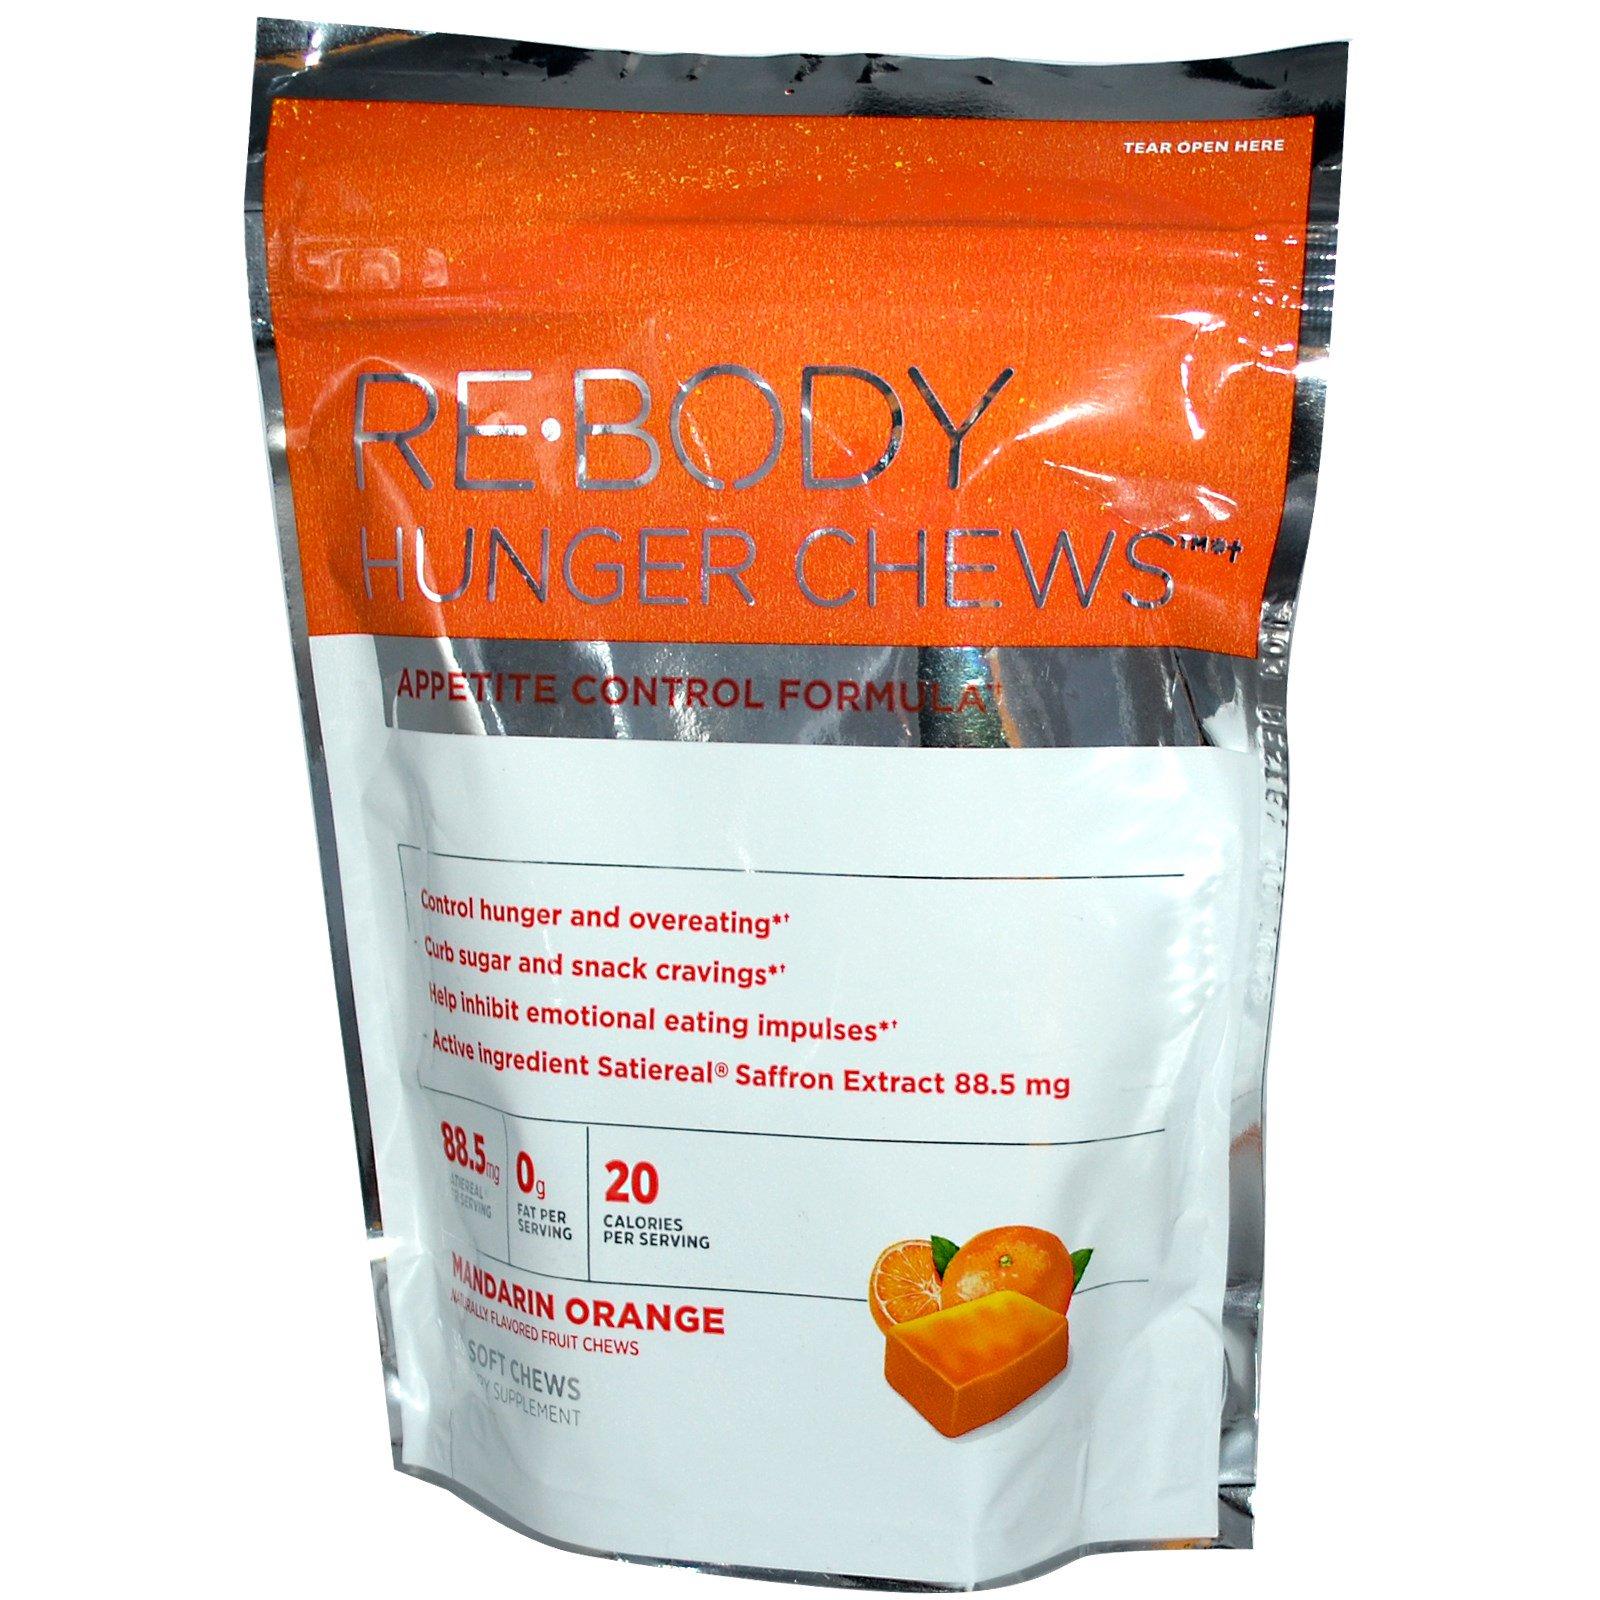 Rebody Safslim Hunger Chews Appetite Control Formula Mandarin